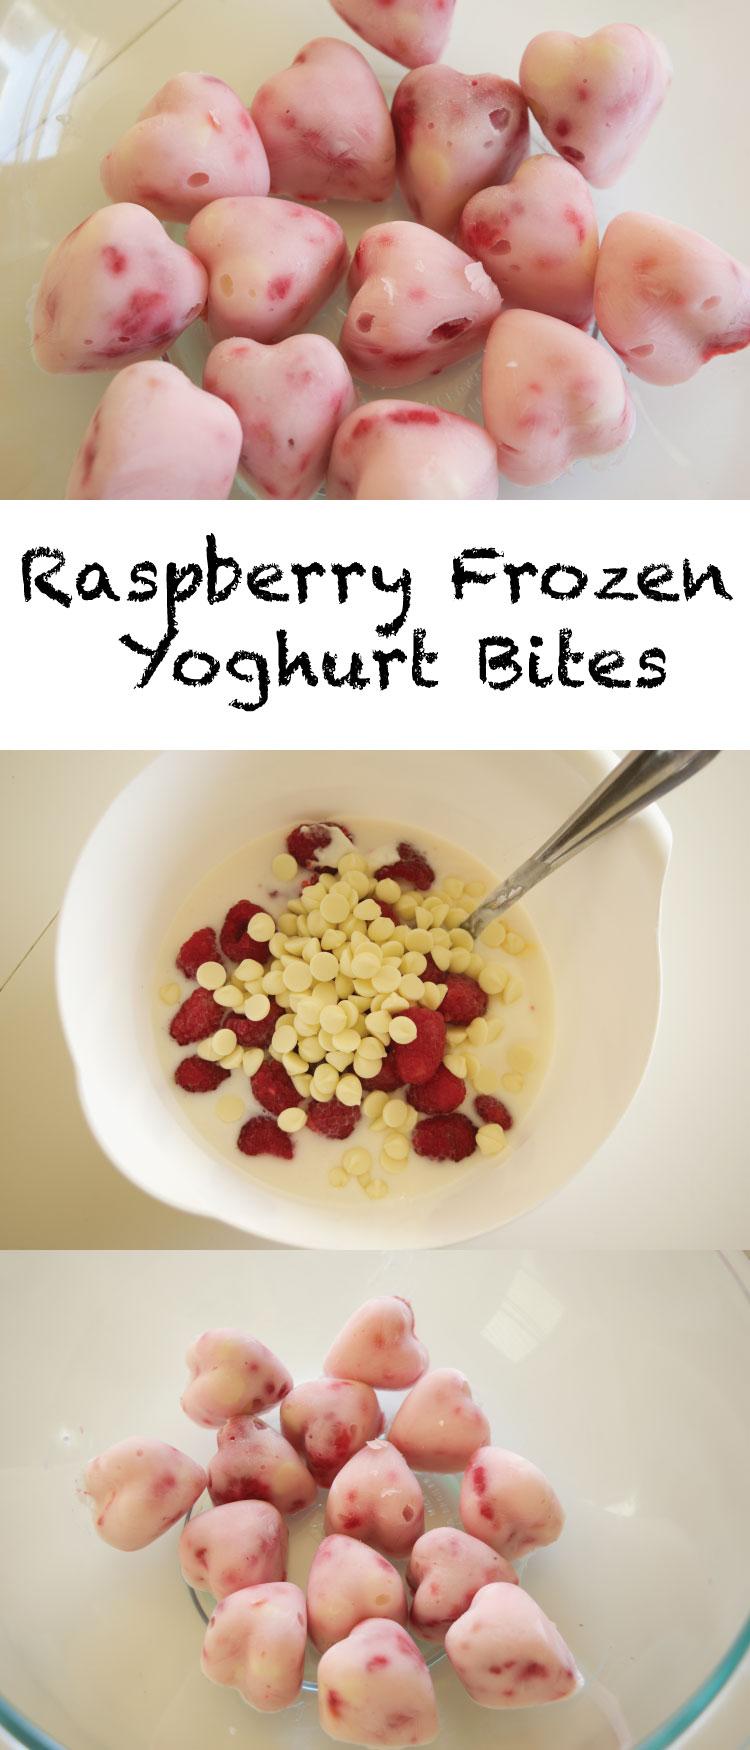 Raspberry-Frozen-Yoghurt-Bites